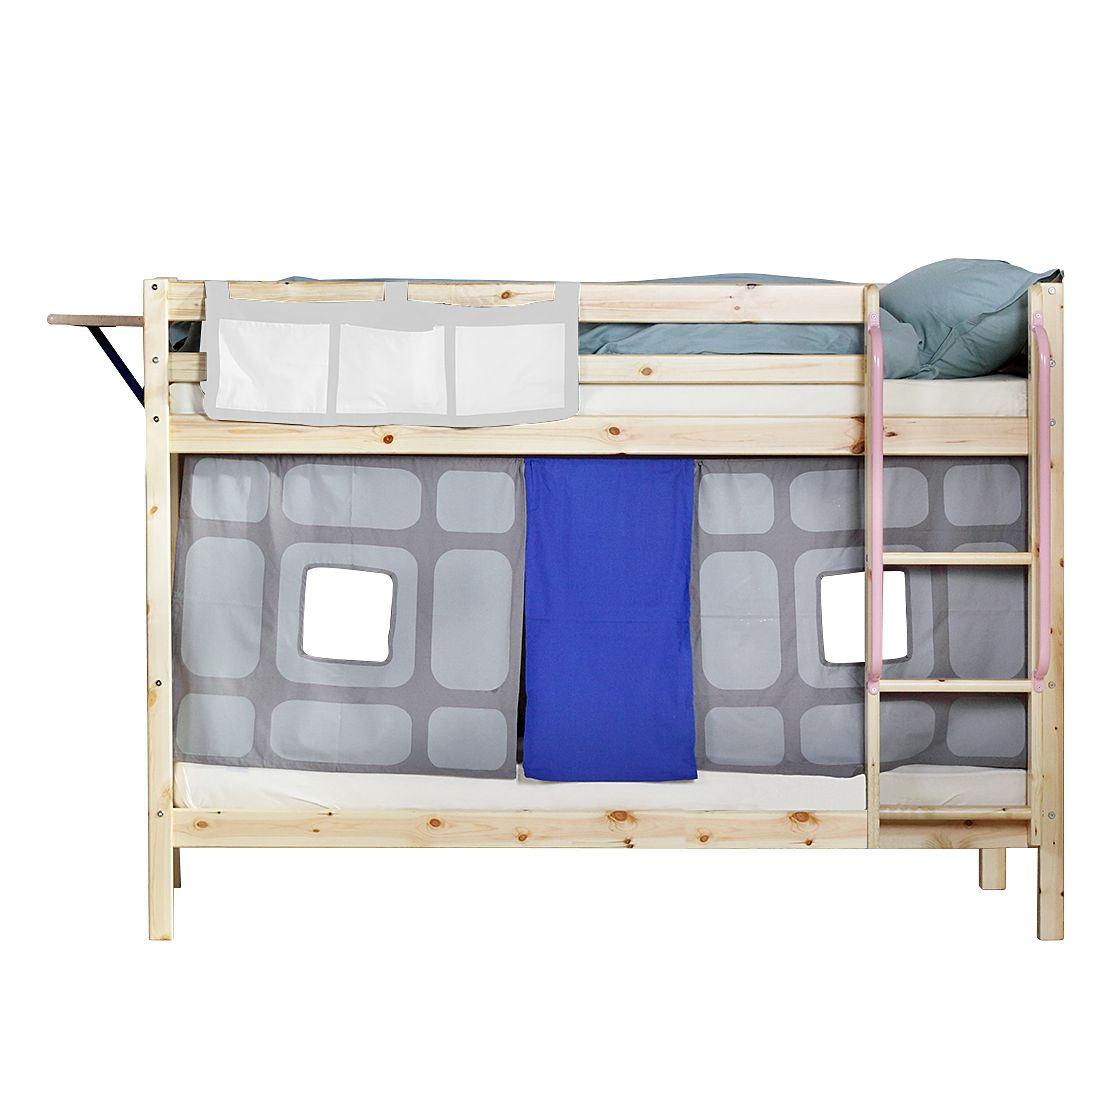 Etagenbett Hit II – Kiefer massiv/Textil – Natur/Ritter, Flexa günstig kaufen